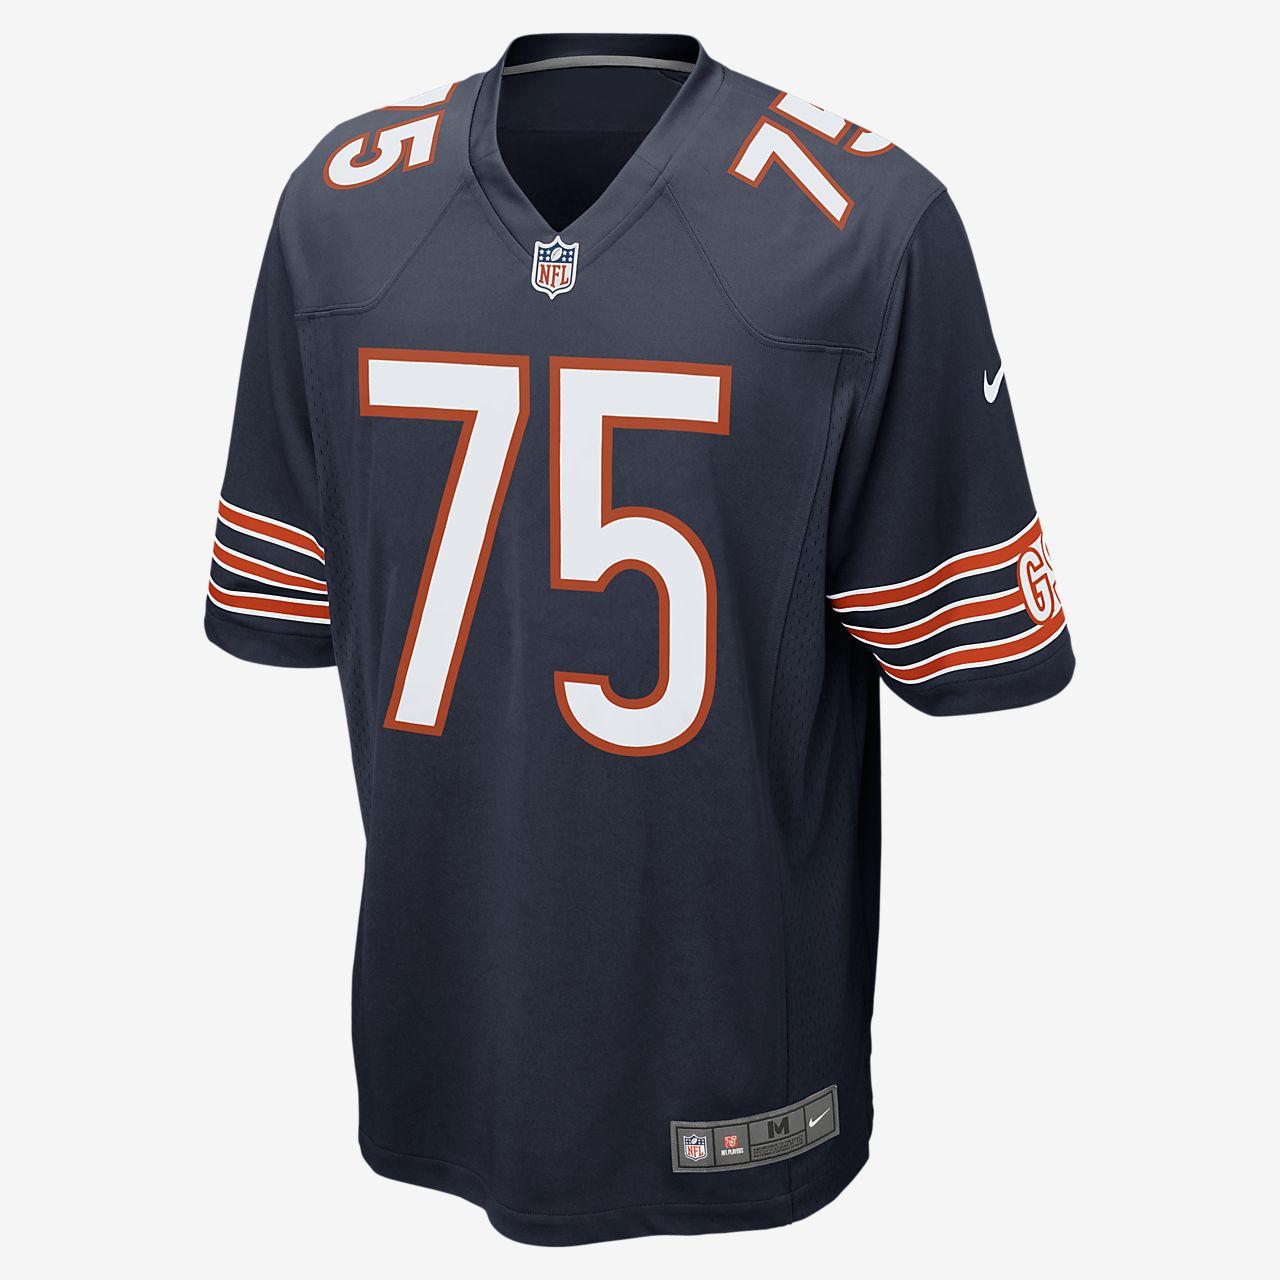 NFL Chicago Bears (Kyle Long) Camiseta de fútbol americano - Hombre ... 04319bd4f1b